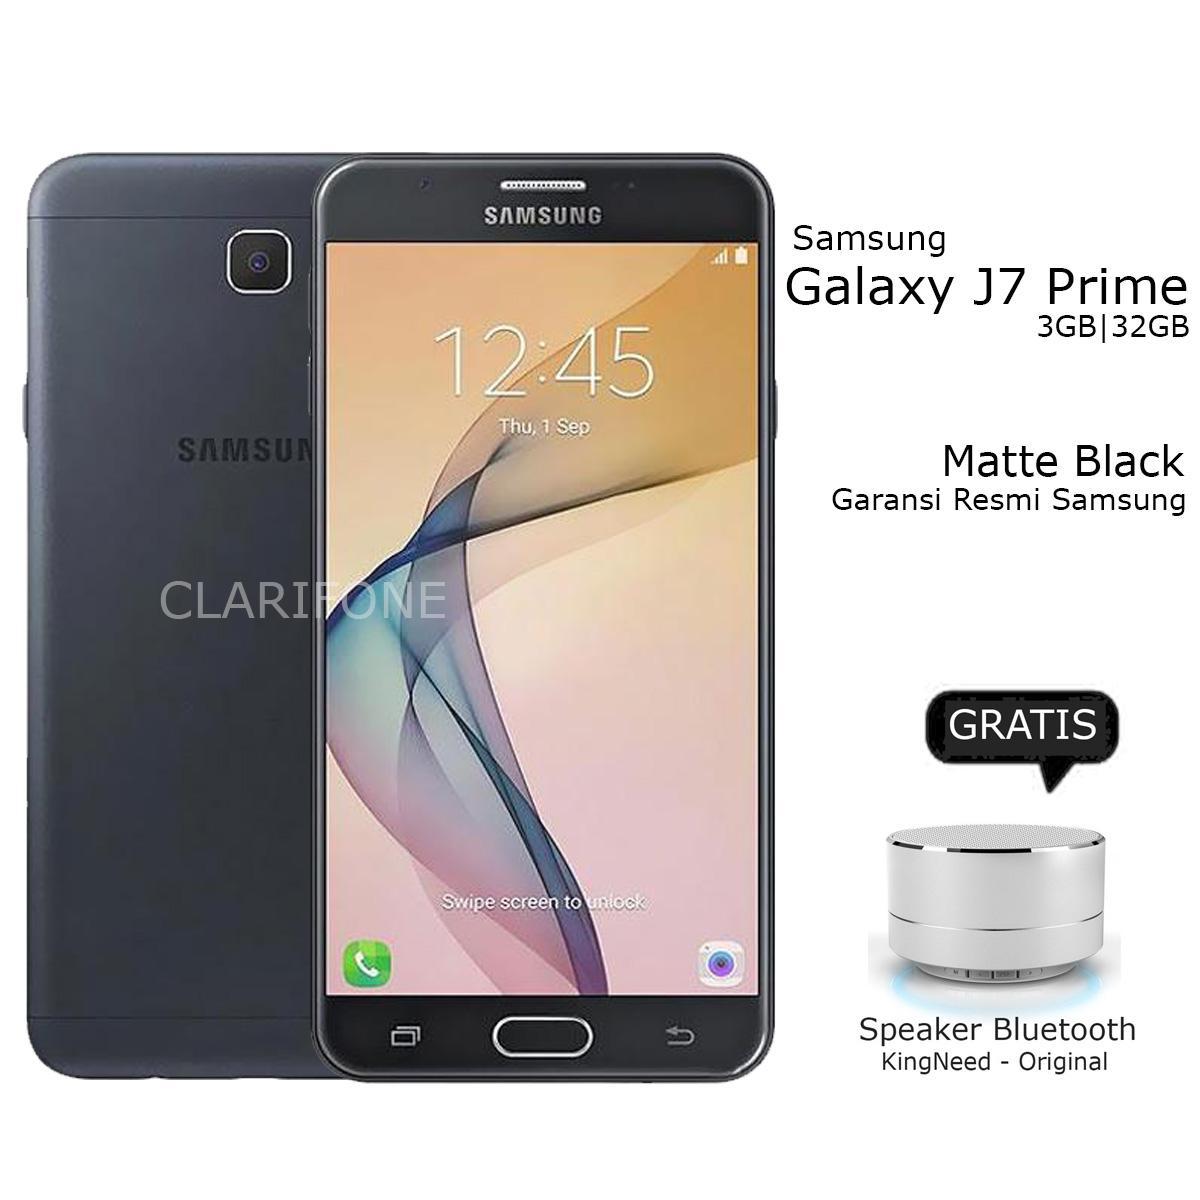 Samsung Galaxy J7 Prime - Layar 5.5 inch - Fingerprint - 32GB - Matte Black